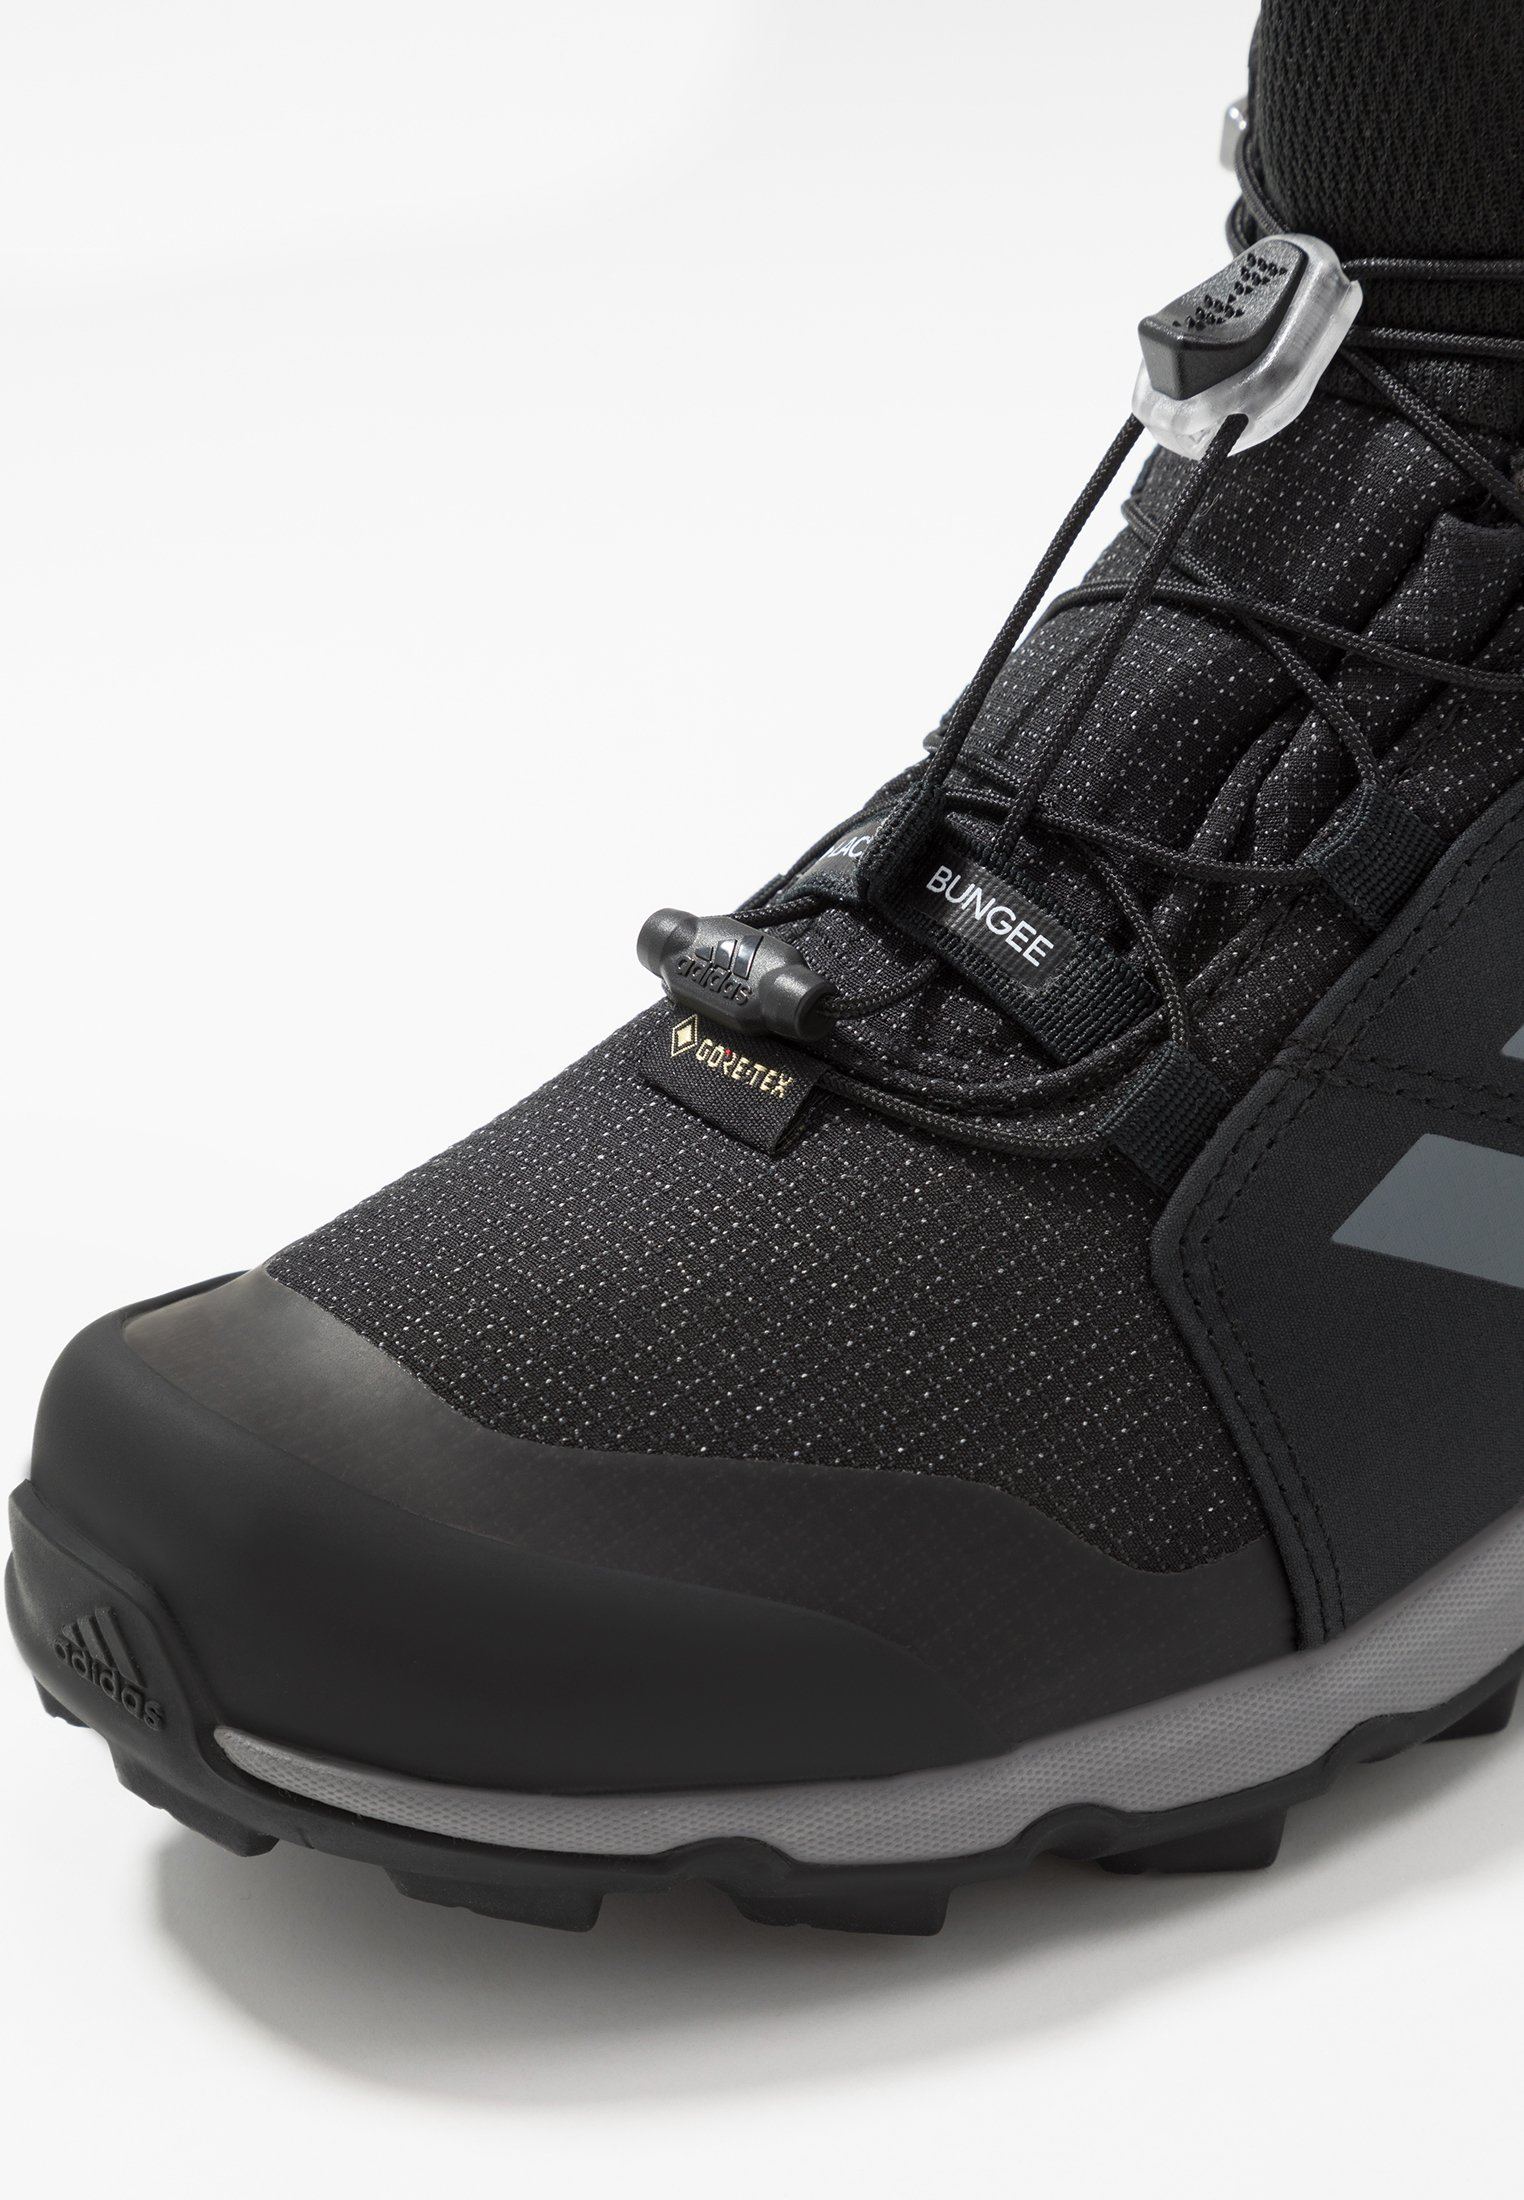 TERREX MID GORE TEX Hikingskor core blackgrey three